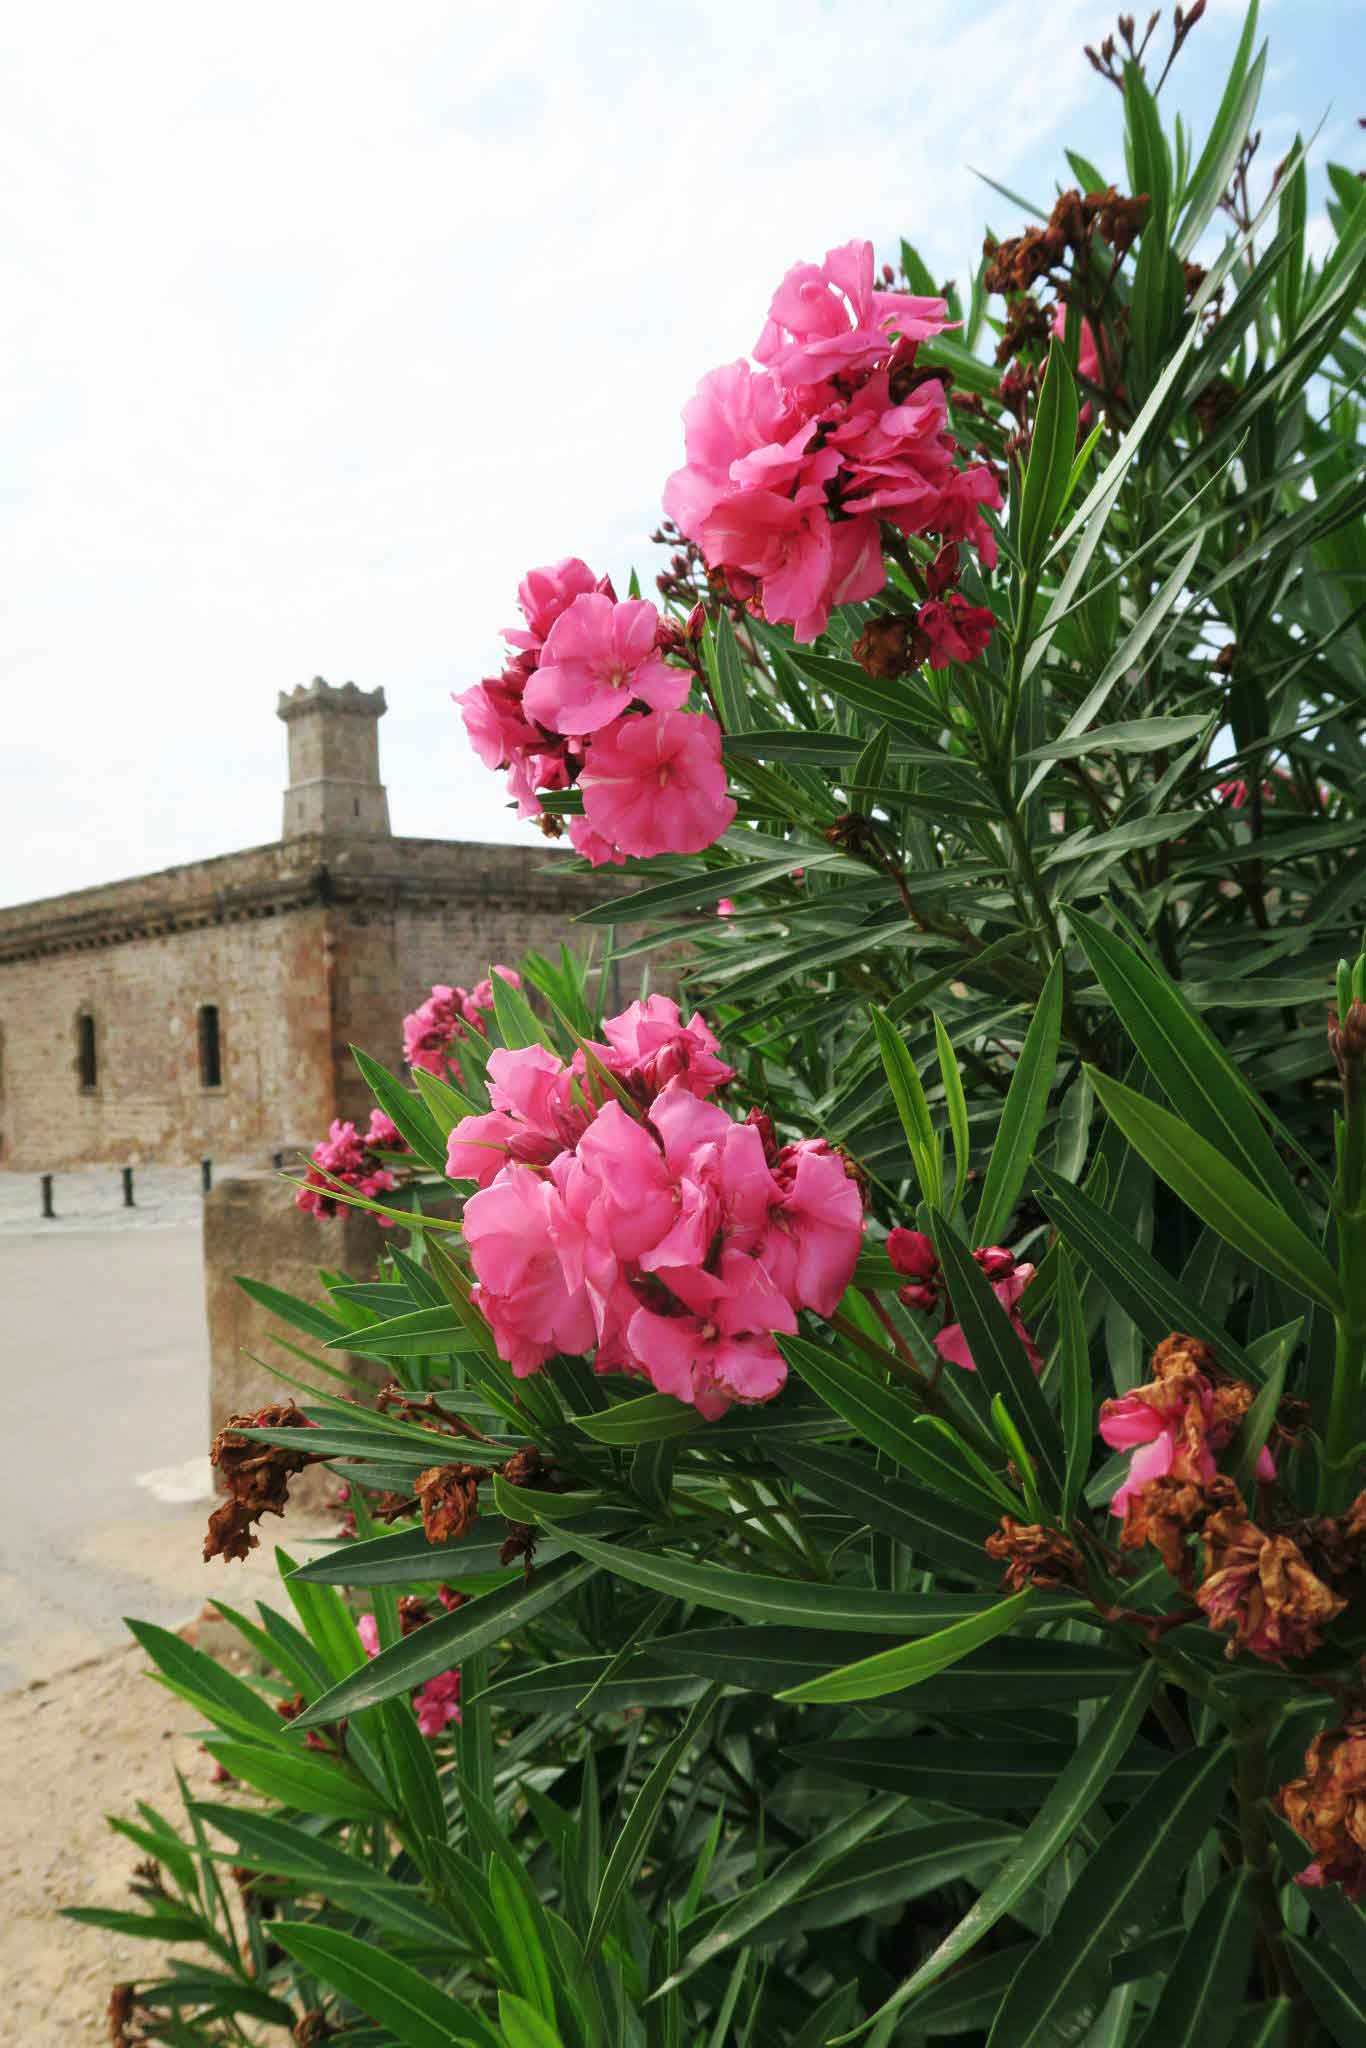 pink flowers in front of Montjuic Castle in Barcelona, Spain